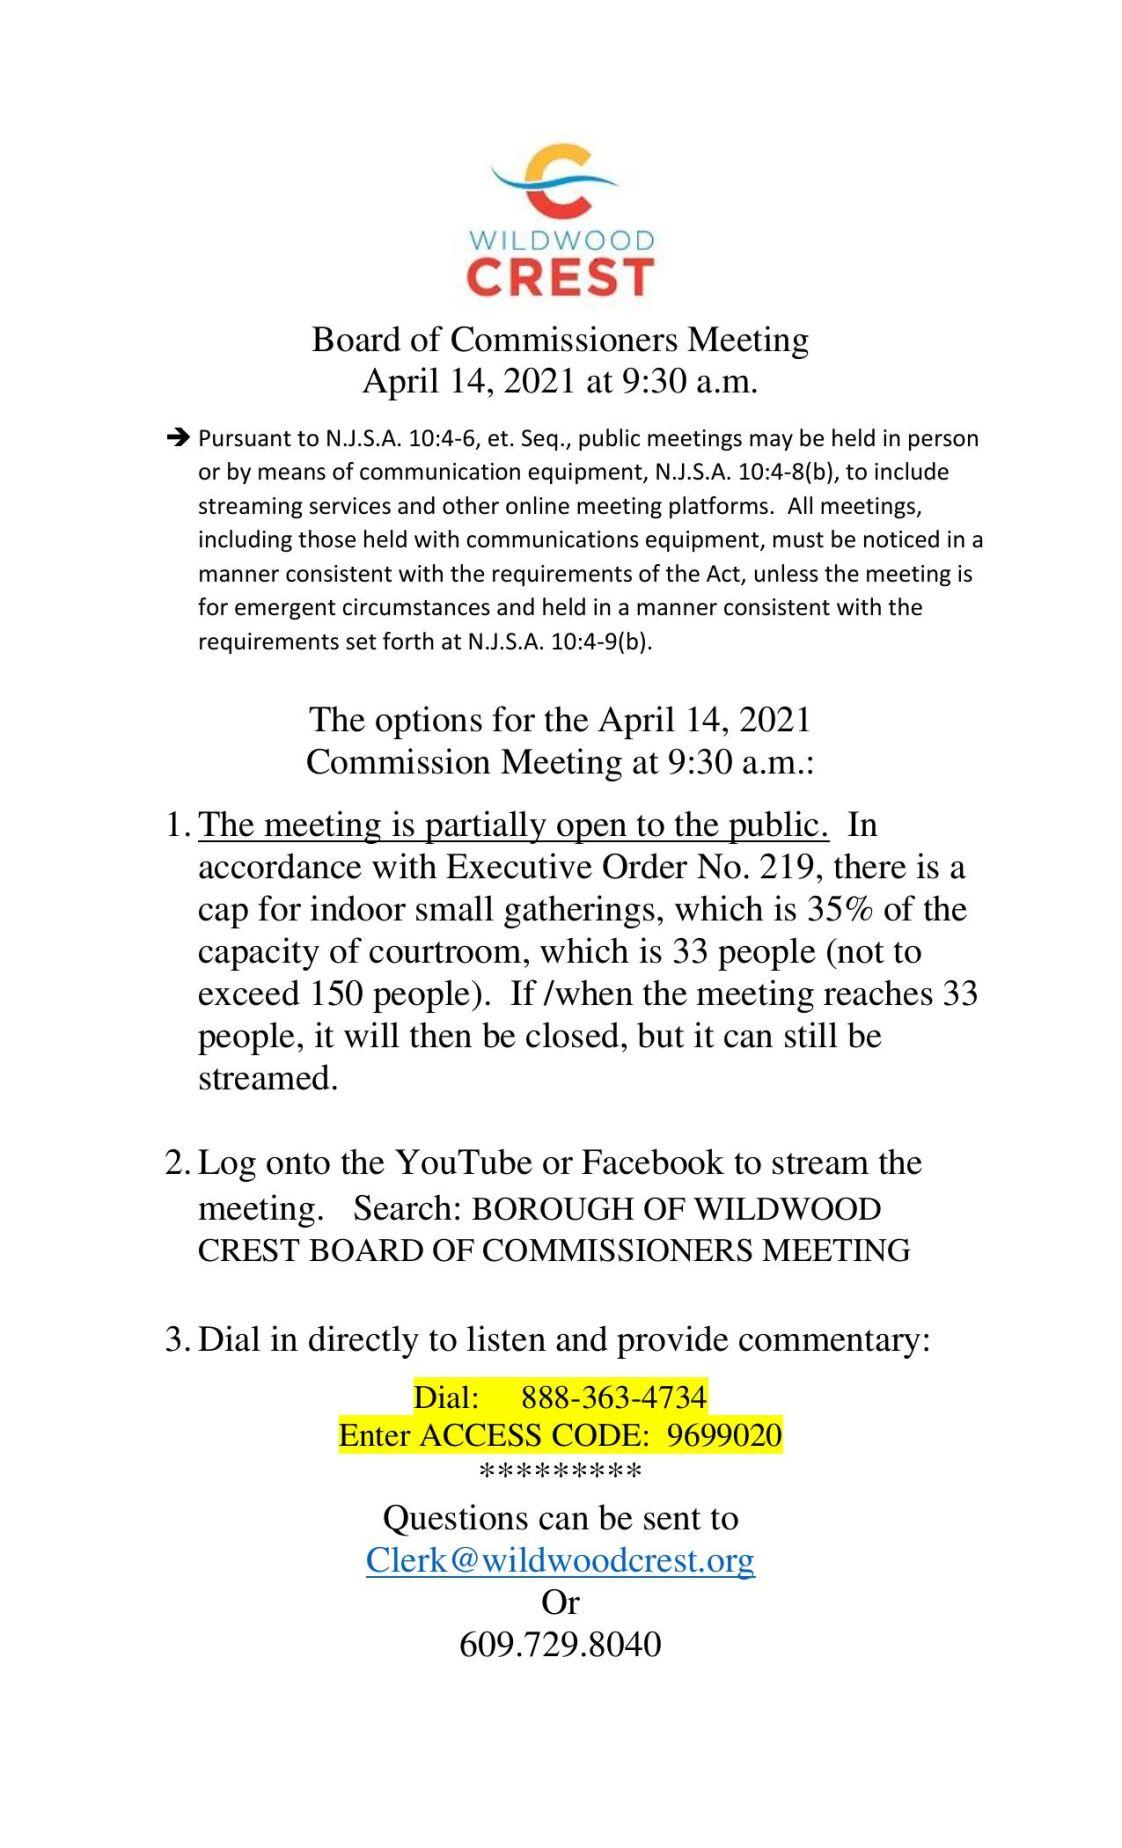 Wildwood Crest Borough Commissioners Meeting Agenda April 14, 2021